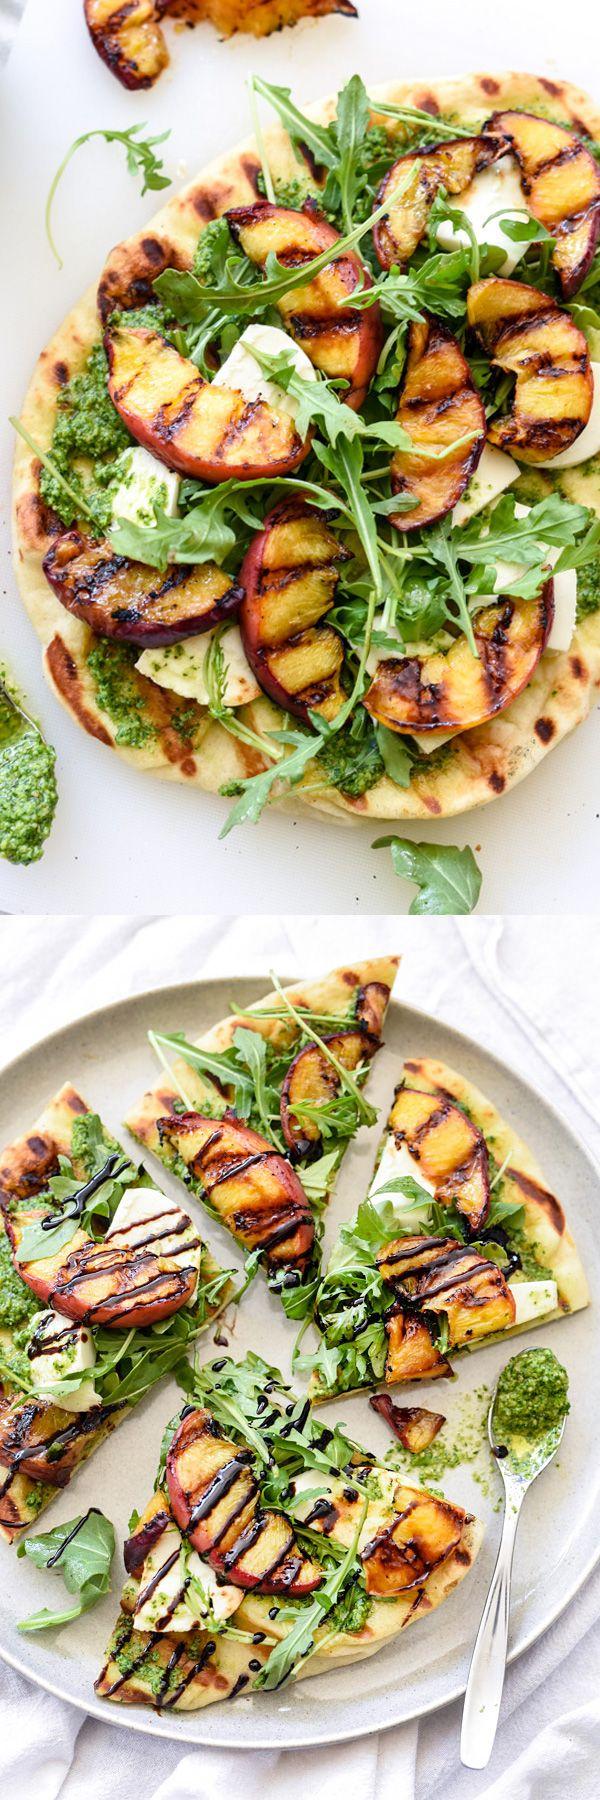 Dinner in 30 minutes! Fresh mozzarella chunks and arugula pesto give this flatbread a bit of a caprese flavor | foodiecrush.com